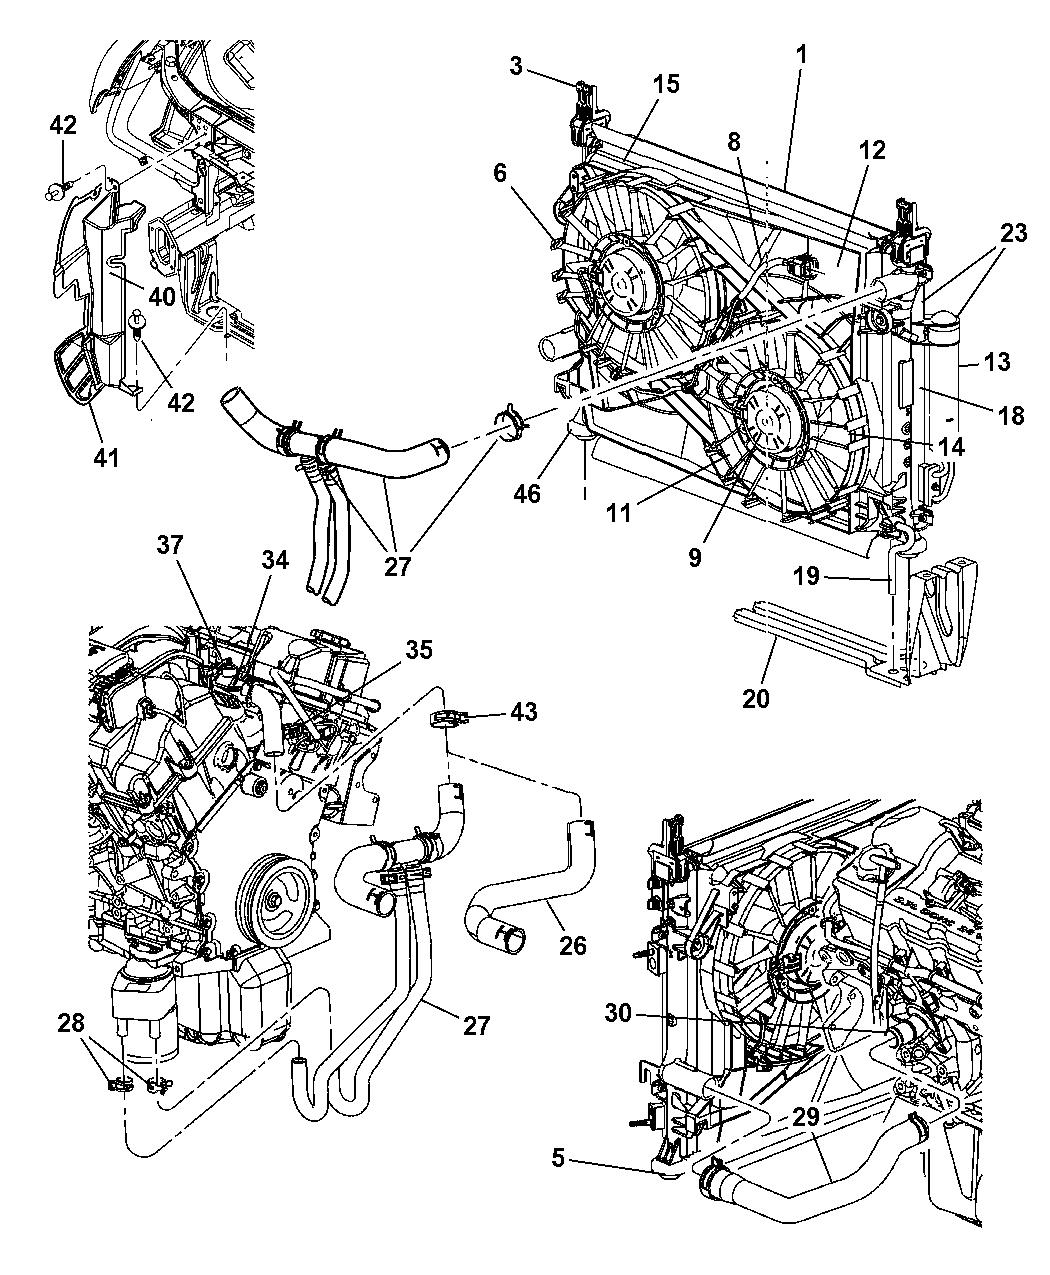 5137692aa genuine mopar radiator engine cooling 2005 Chrysler 300 Touring 2007 chrysler 300 radiator \u0026 related parts